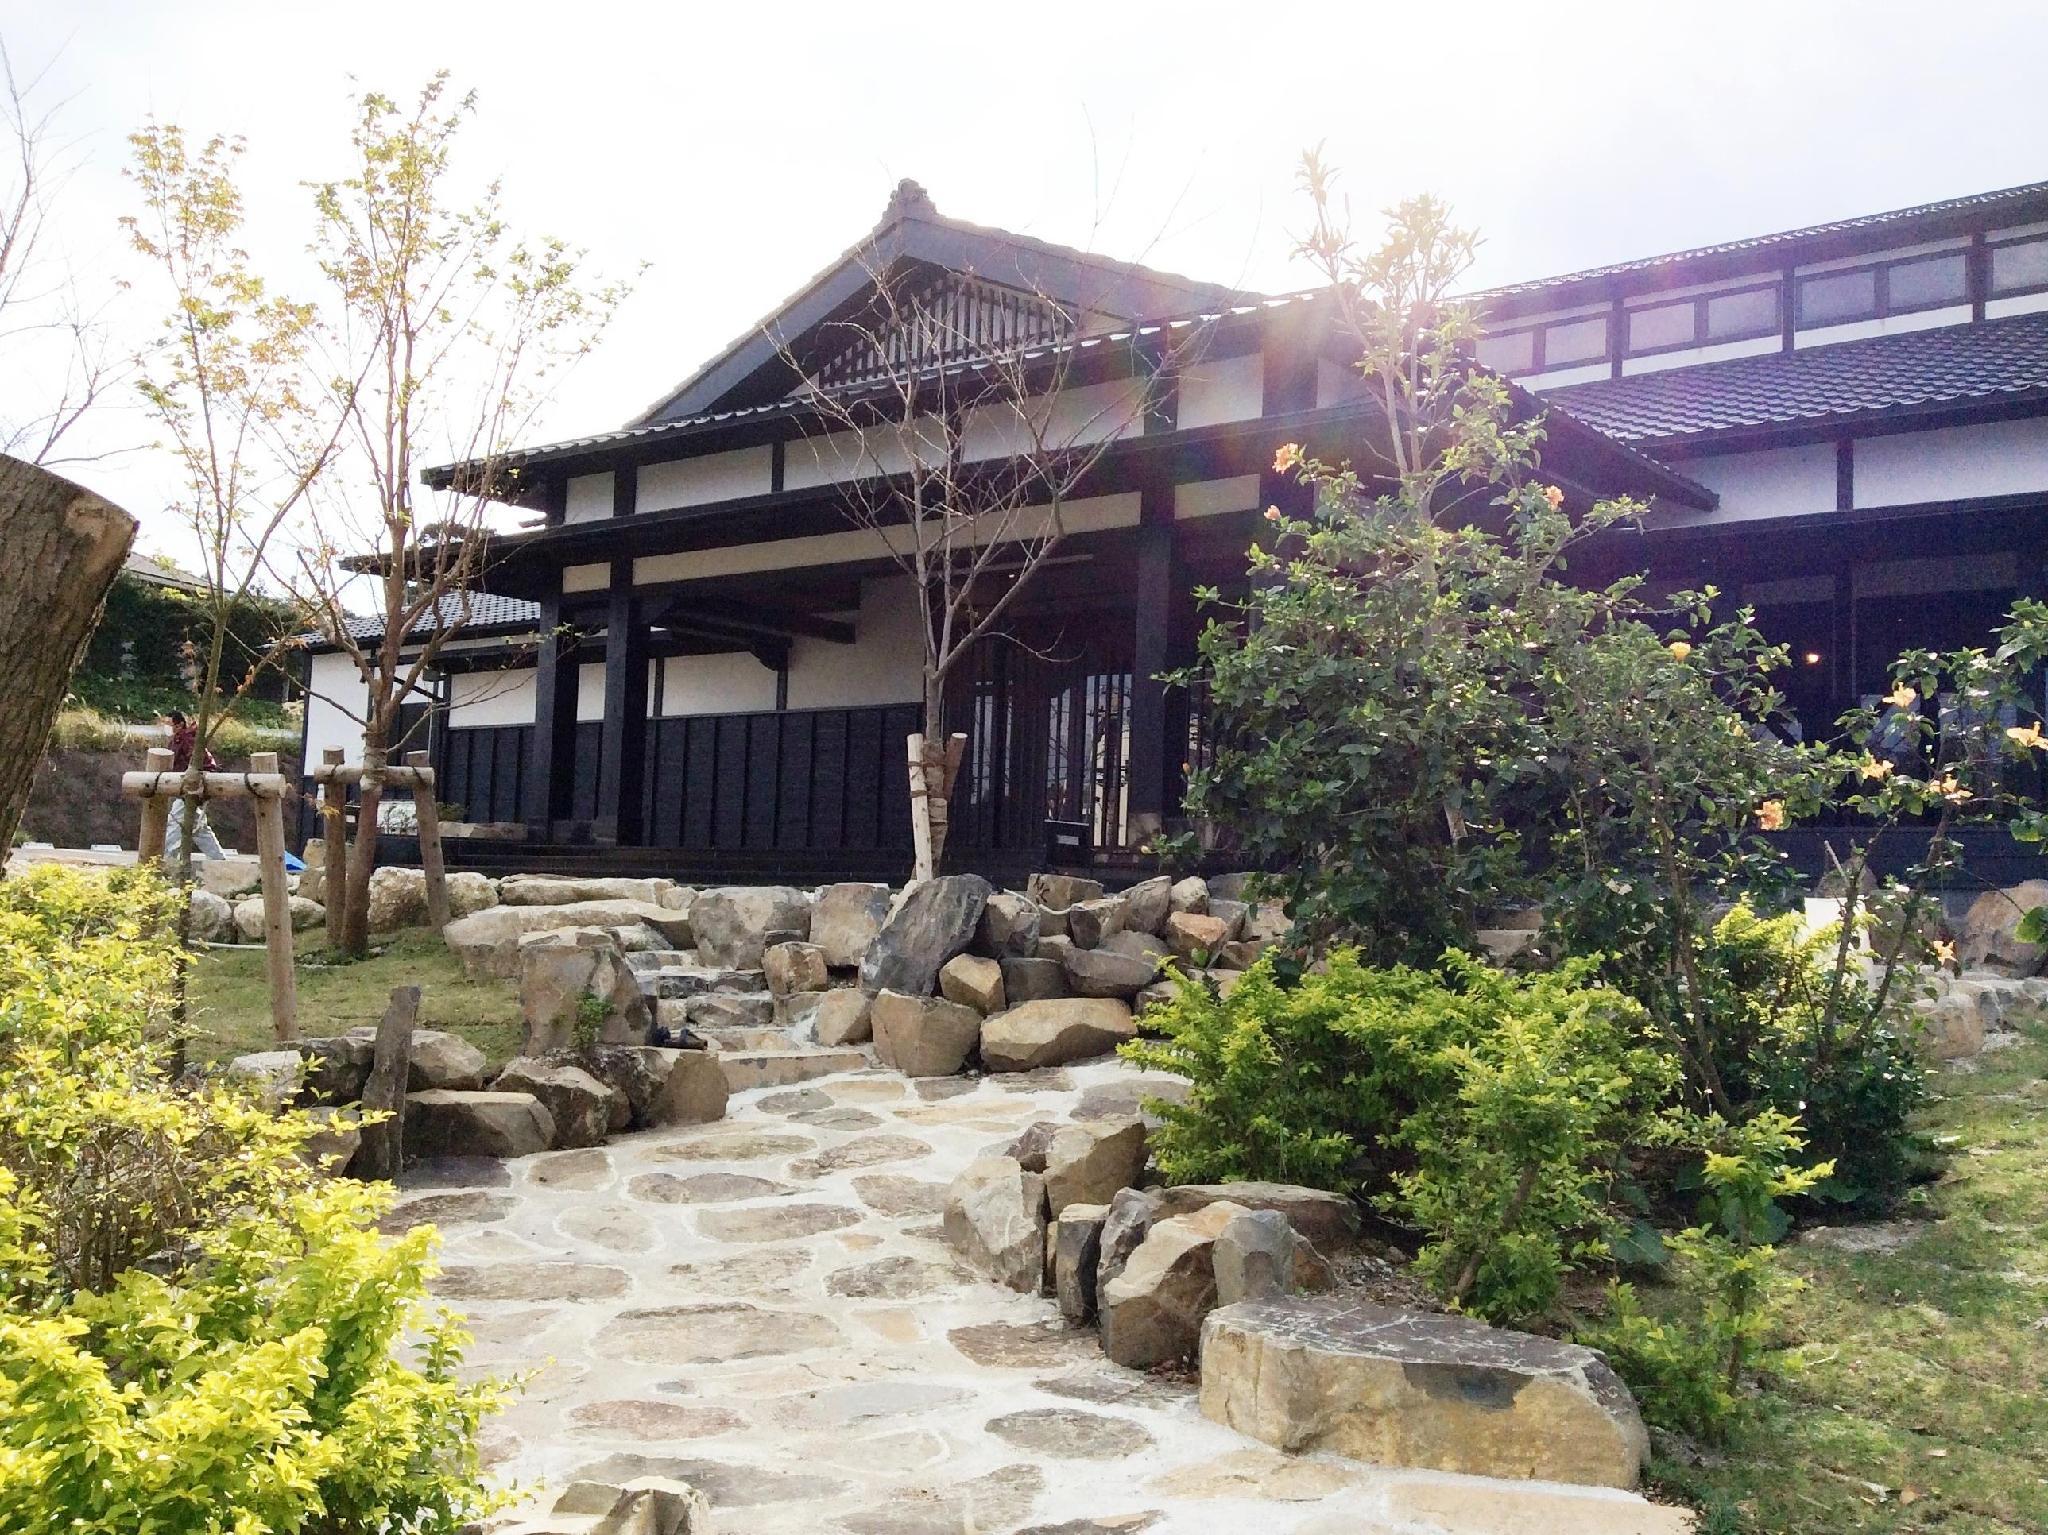 Yakushima Manten Ryokan